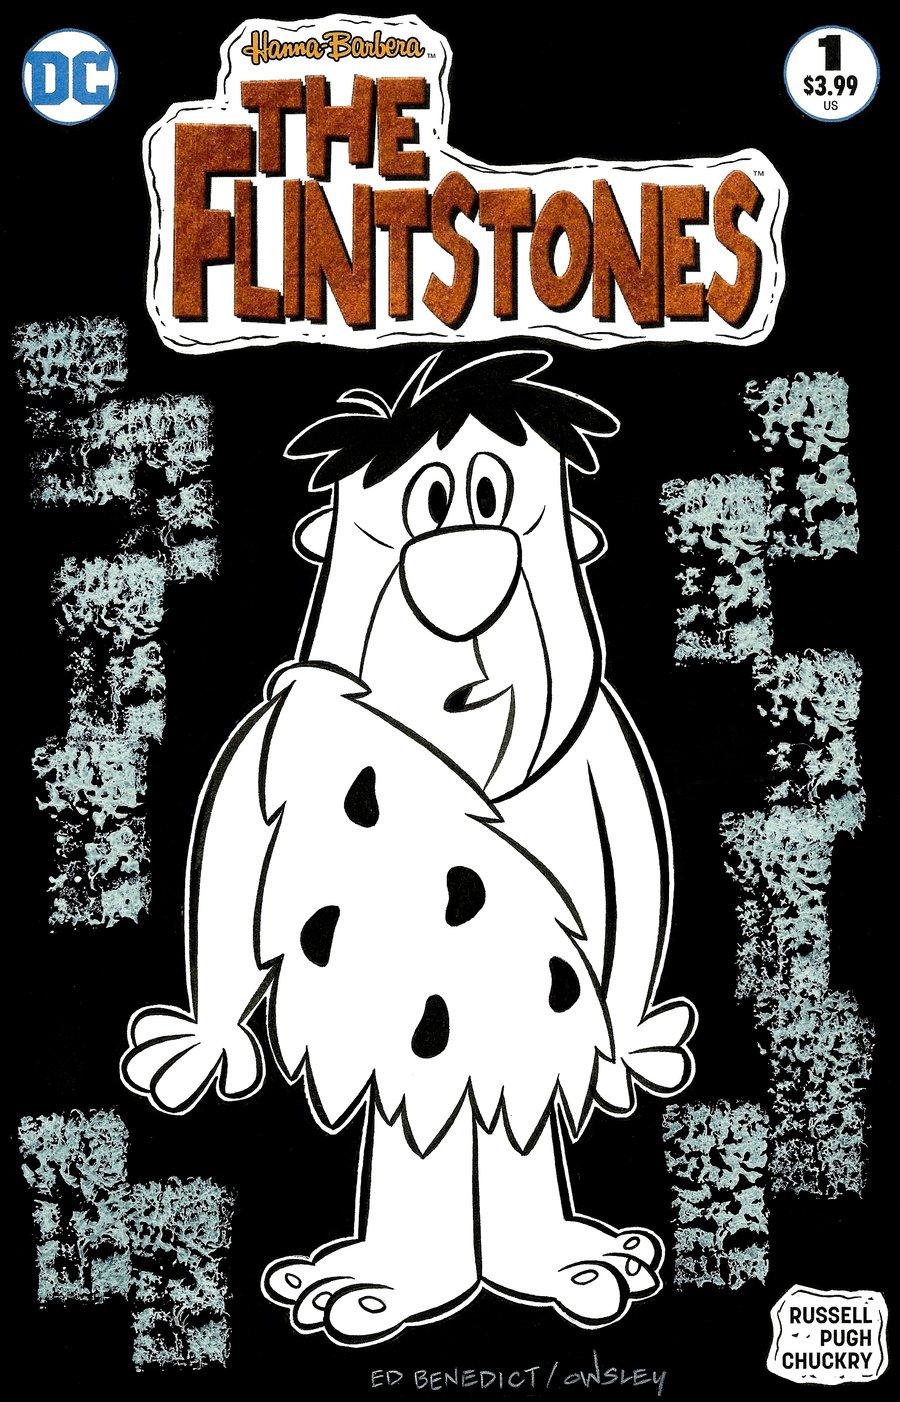 Image of FRED FLINTSTONE! THE FLINTSTONES ORIGINAL ART SKETCH COVER! ED BENEDICT TRIBUTE!